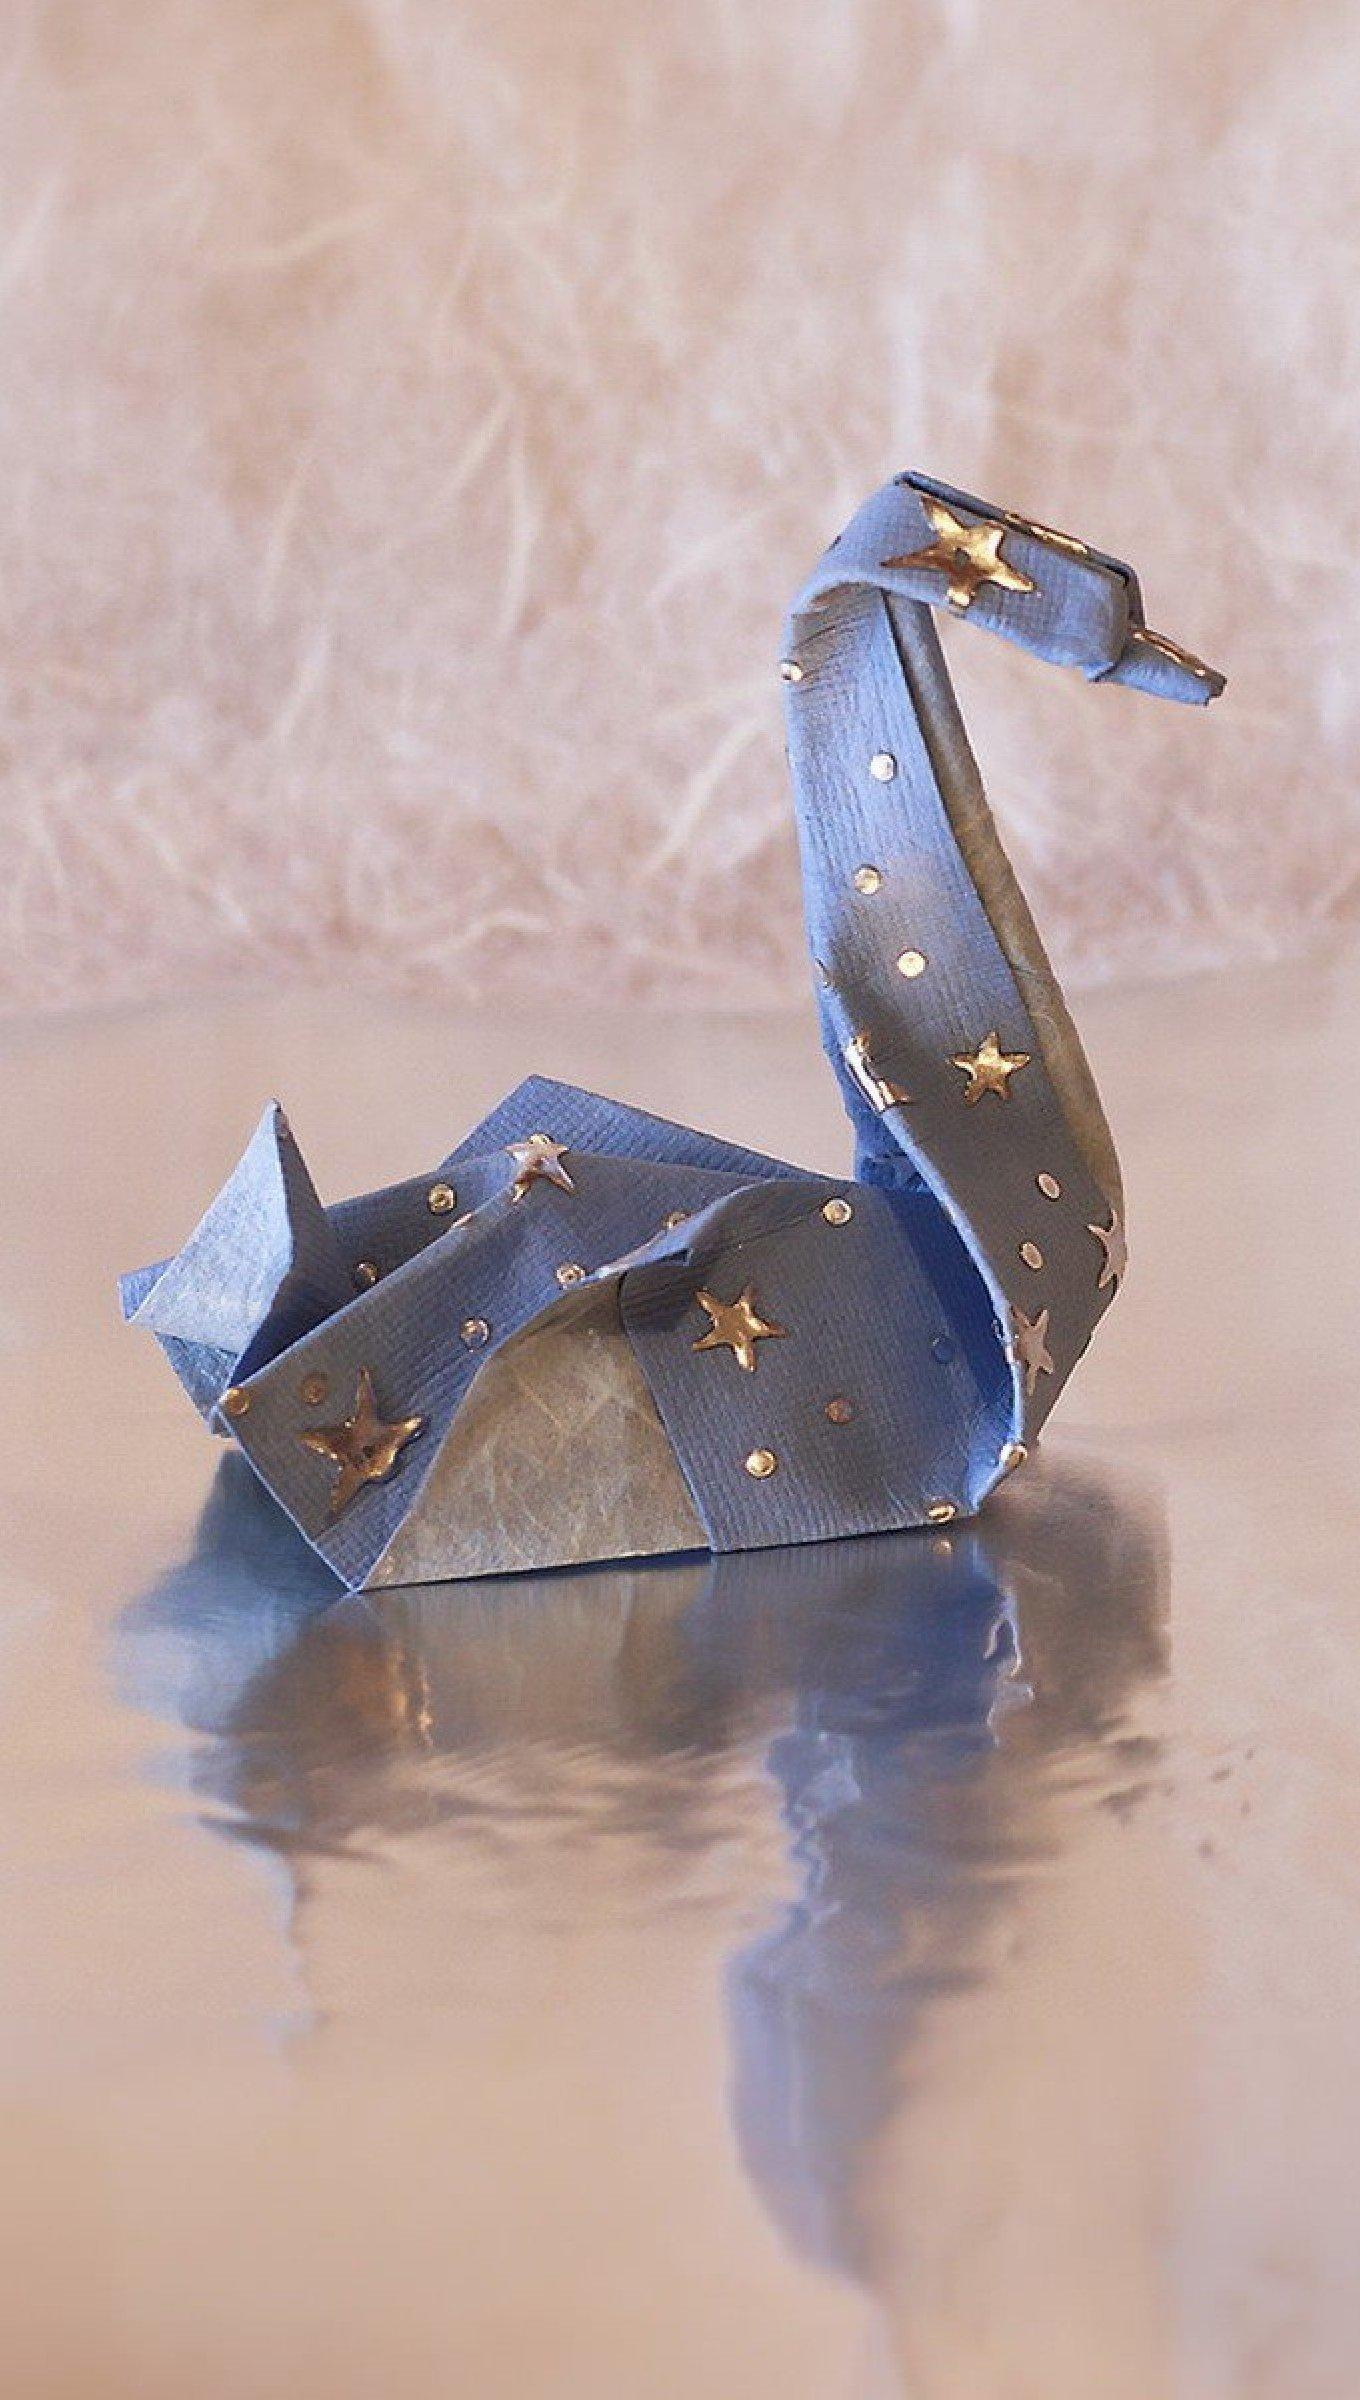 Fondos de pantalla Cisne de origami Vertical